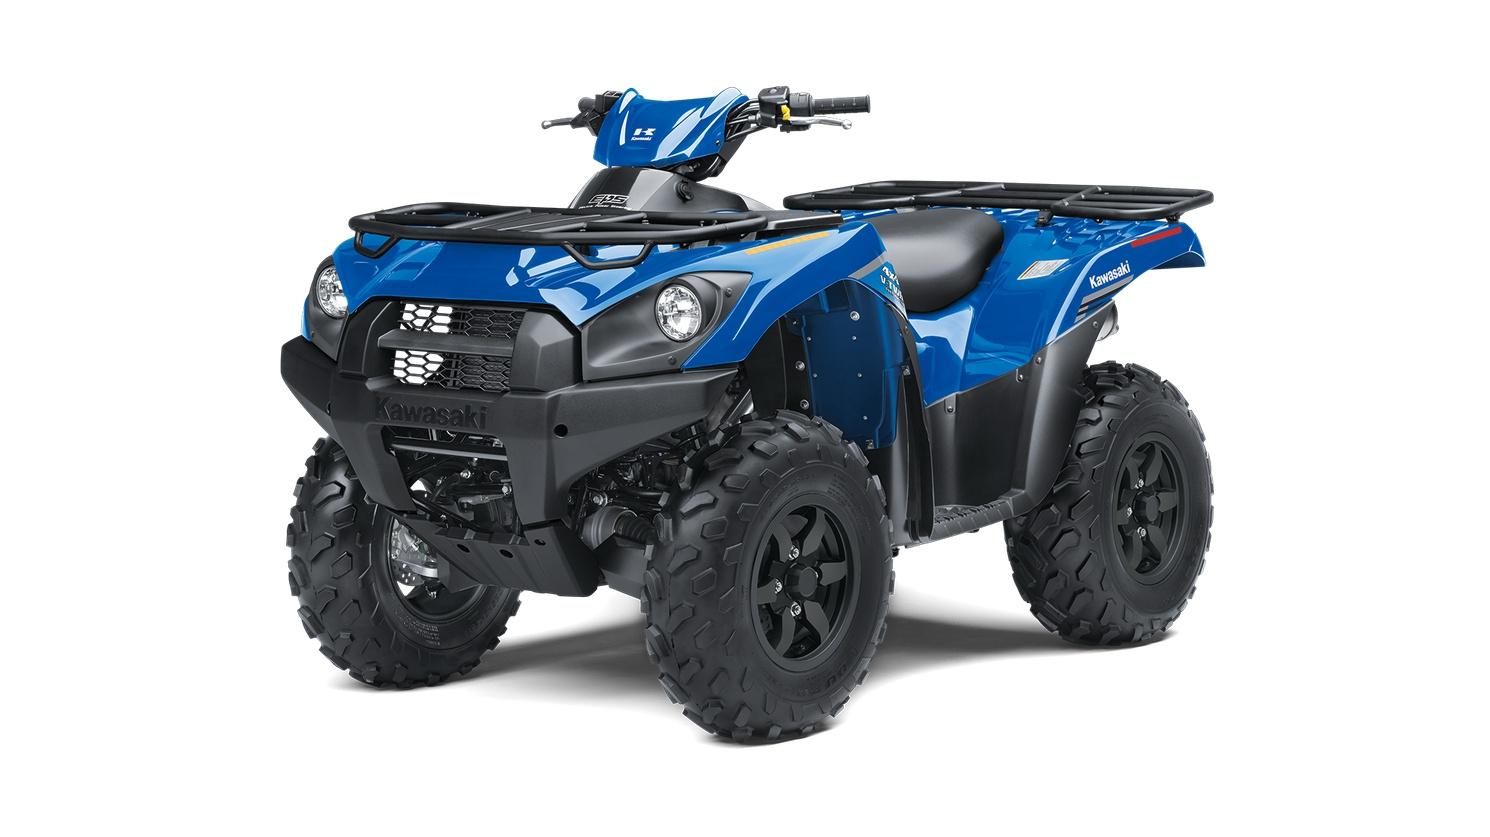 Kawasaki BRUTE FORCE 750 4x4i EPS Bleu Vibrant 2020